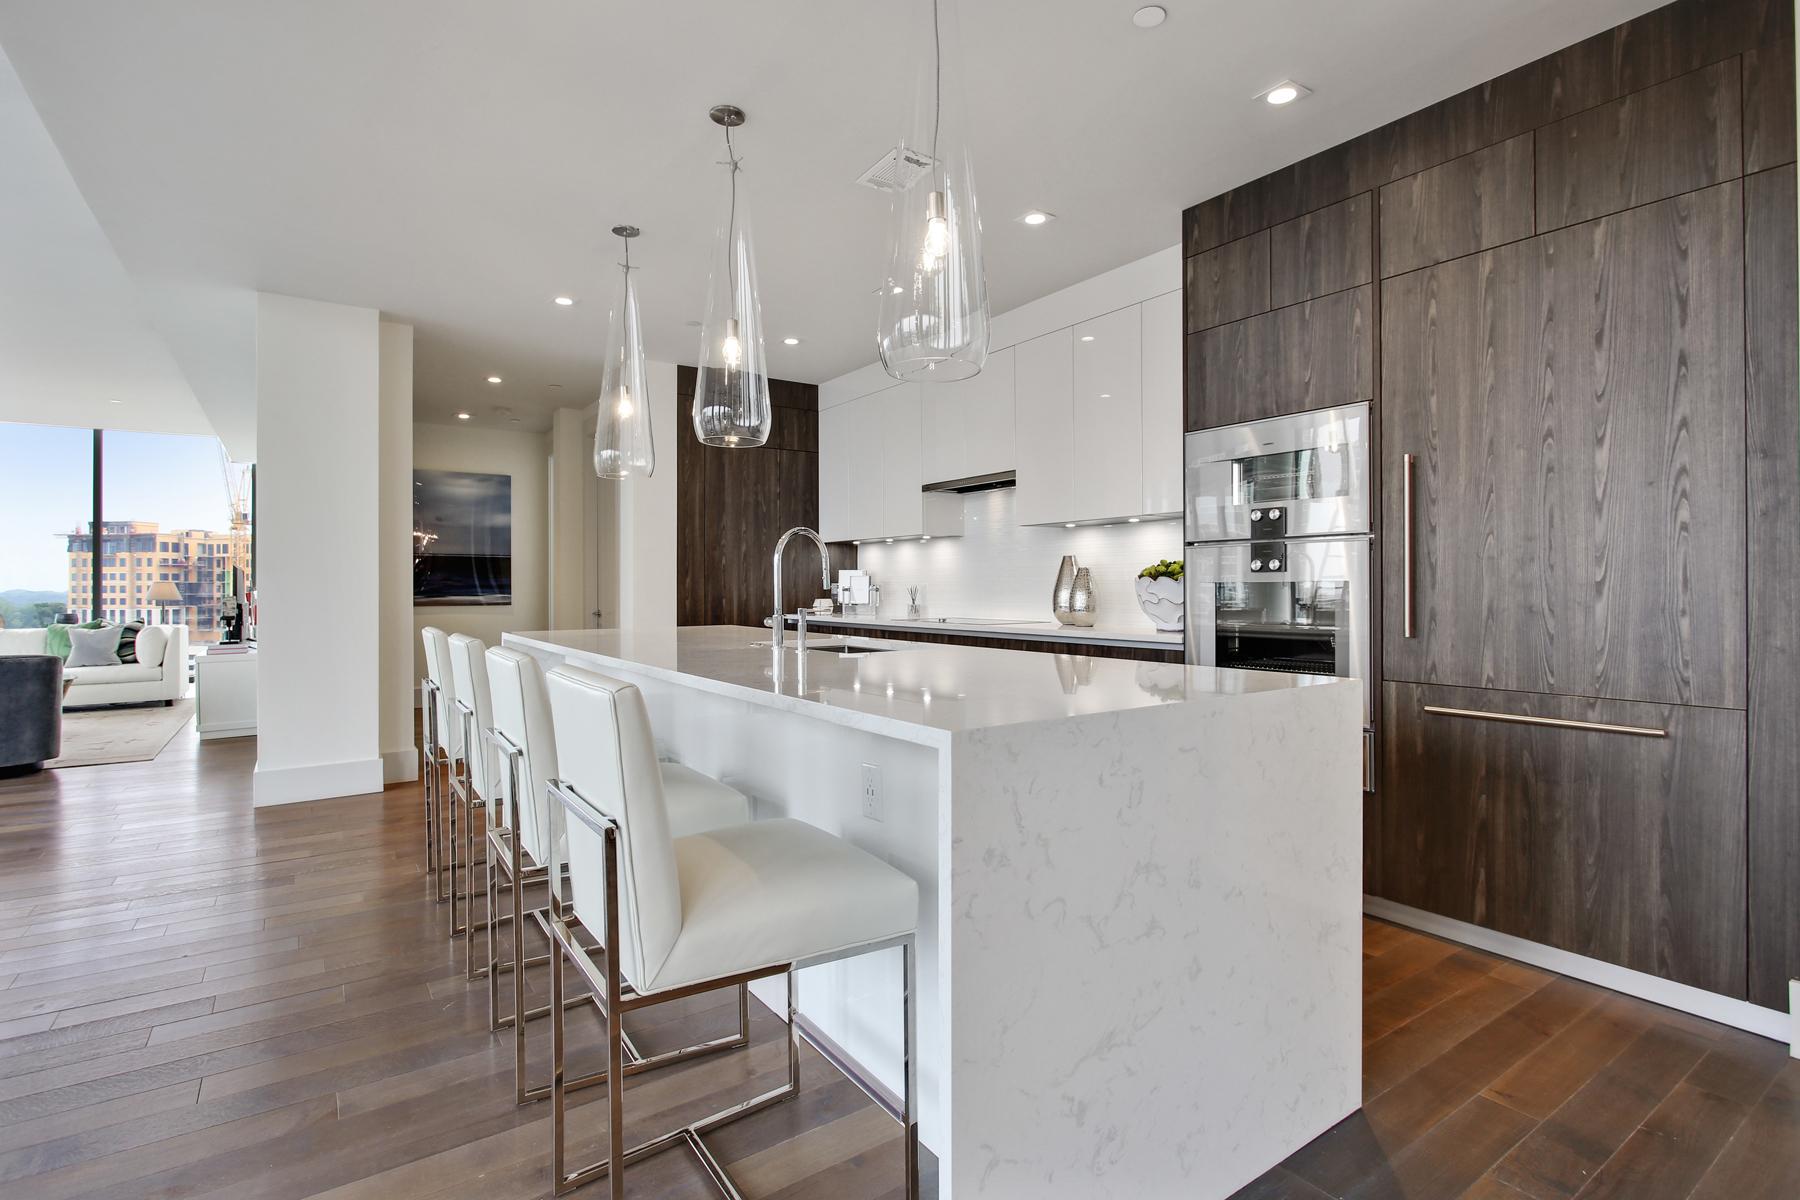 Condominiums для того Продажа на Luxury Condo The Charles 3099 Peachtree Road NE No. 1002, Atlanta, Джорджия 30305 Соединенные Штаты